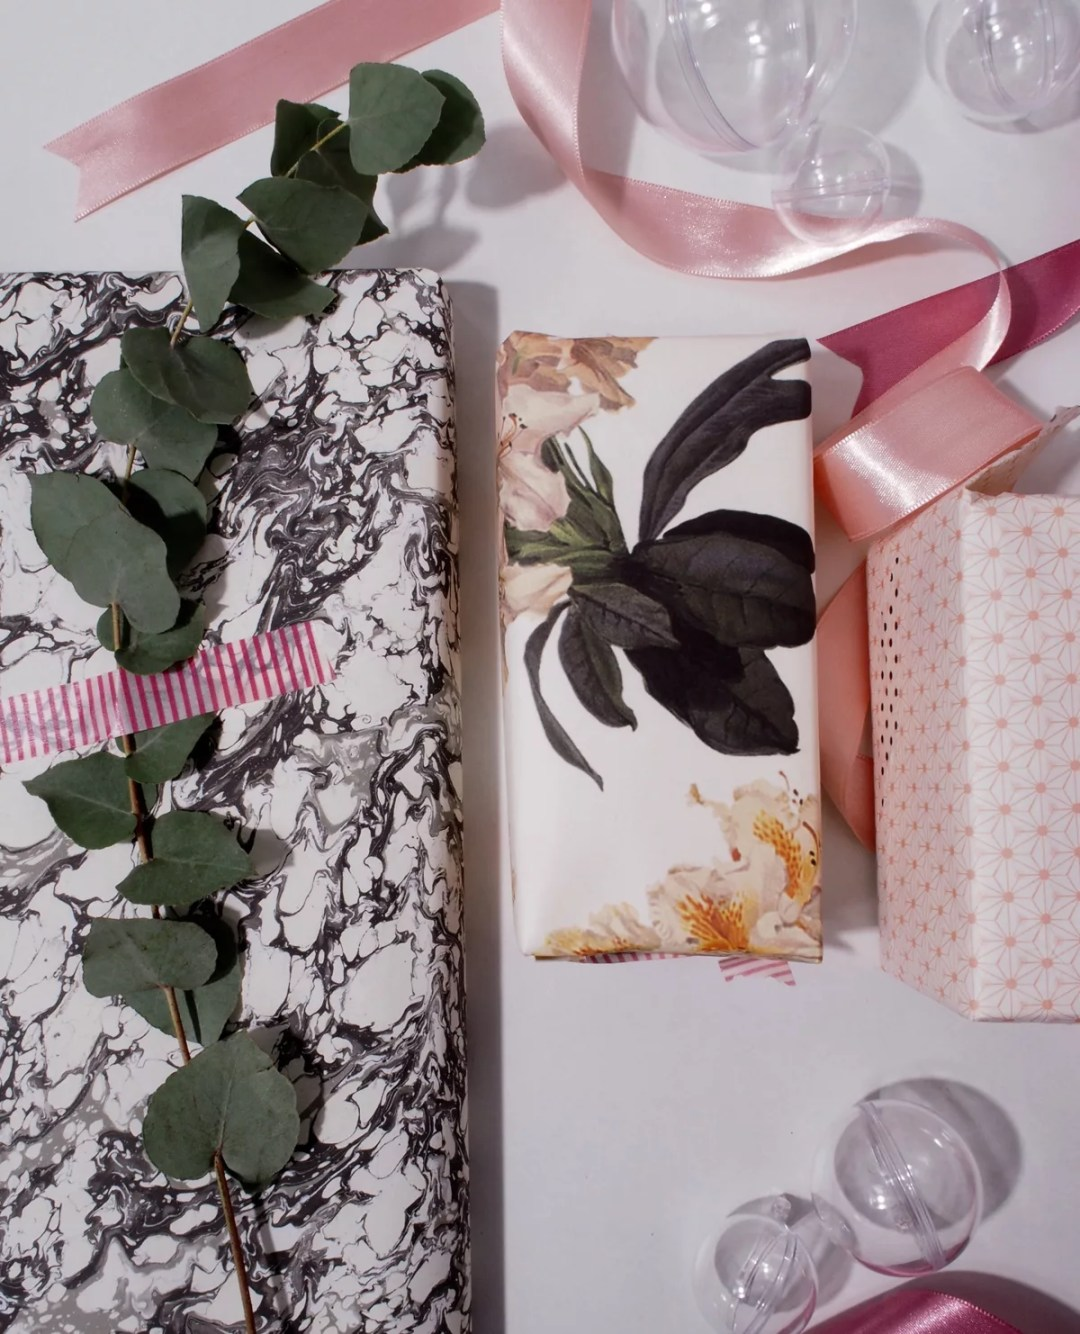 beautyblog-beauty-blog-bare-minds-Elina-Neumann bare minds Adventskalender 2016.jpg